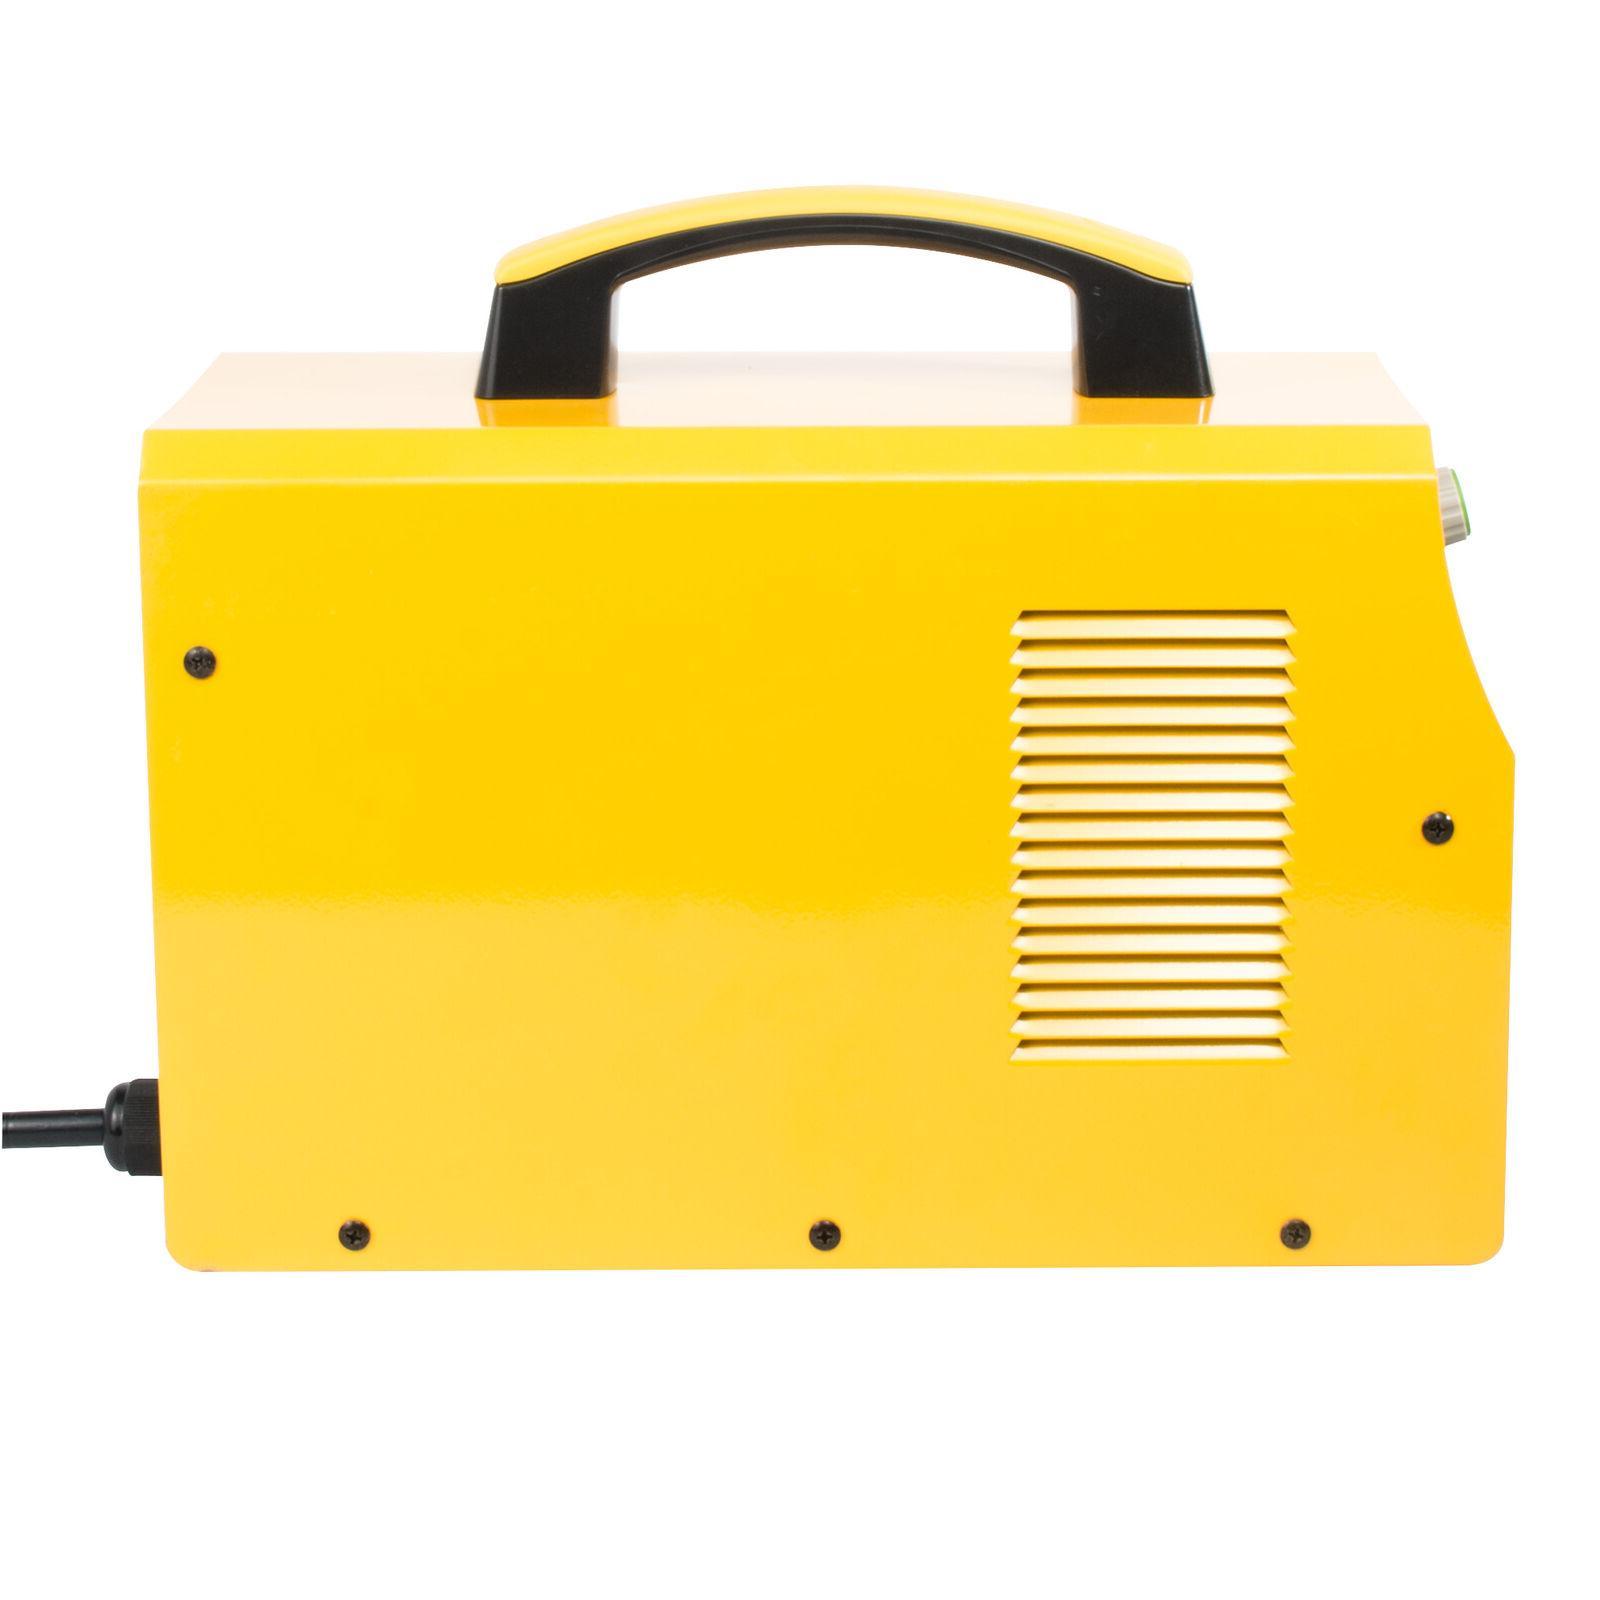 110V/220V TIG Welder ARC Welder 200A Inverter Welding Machine